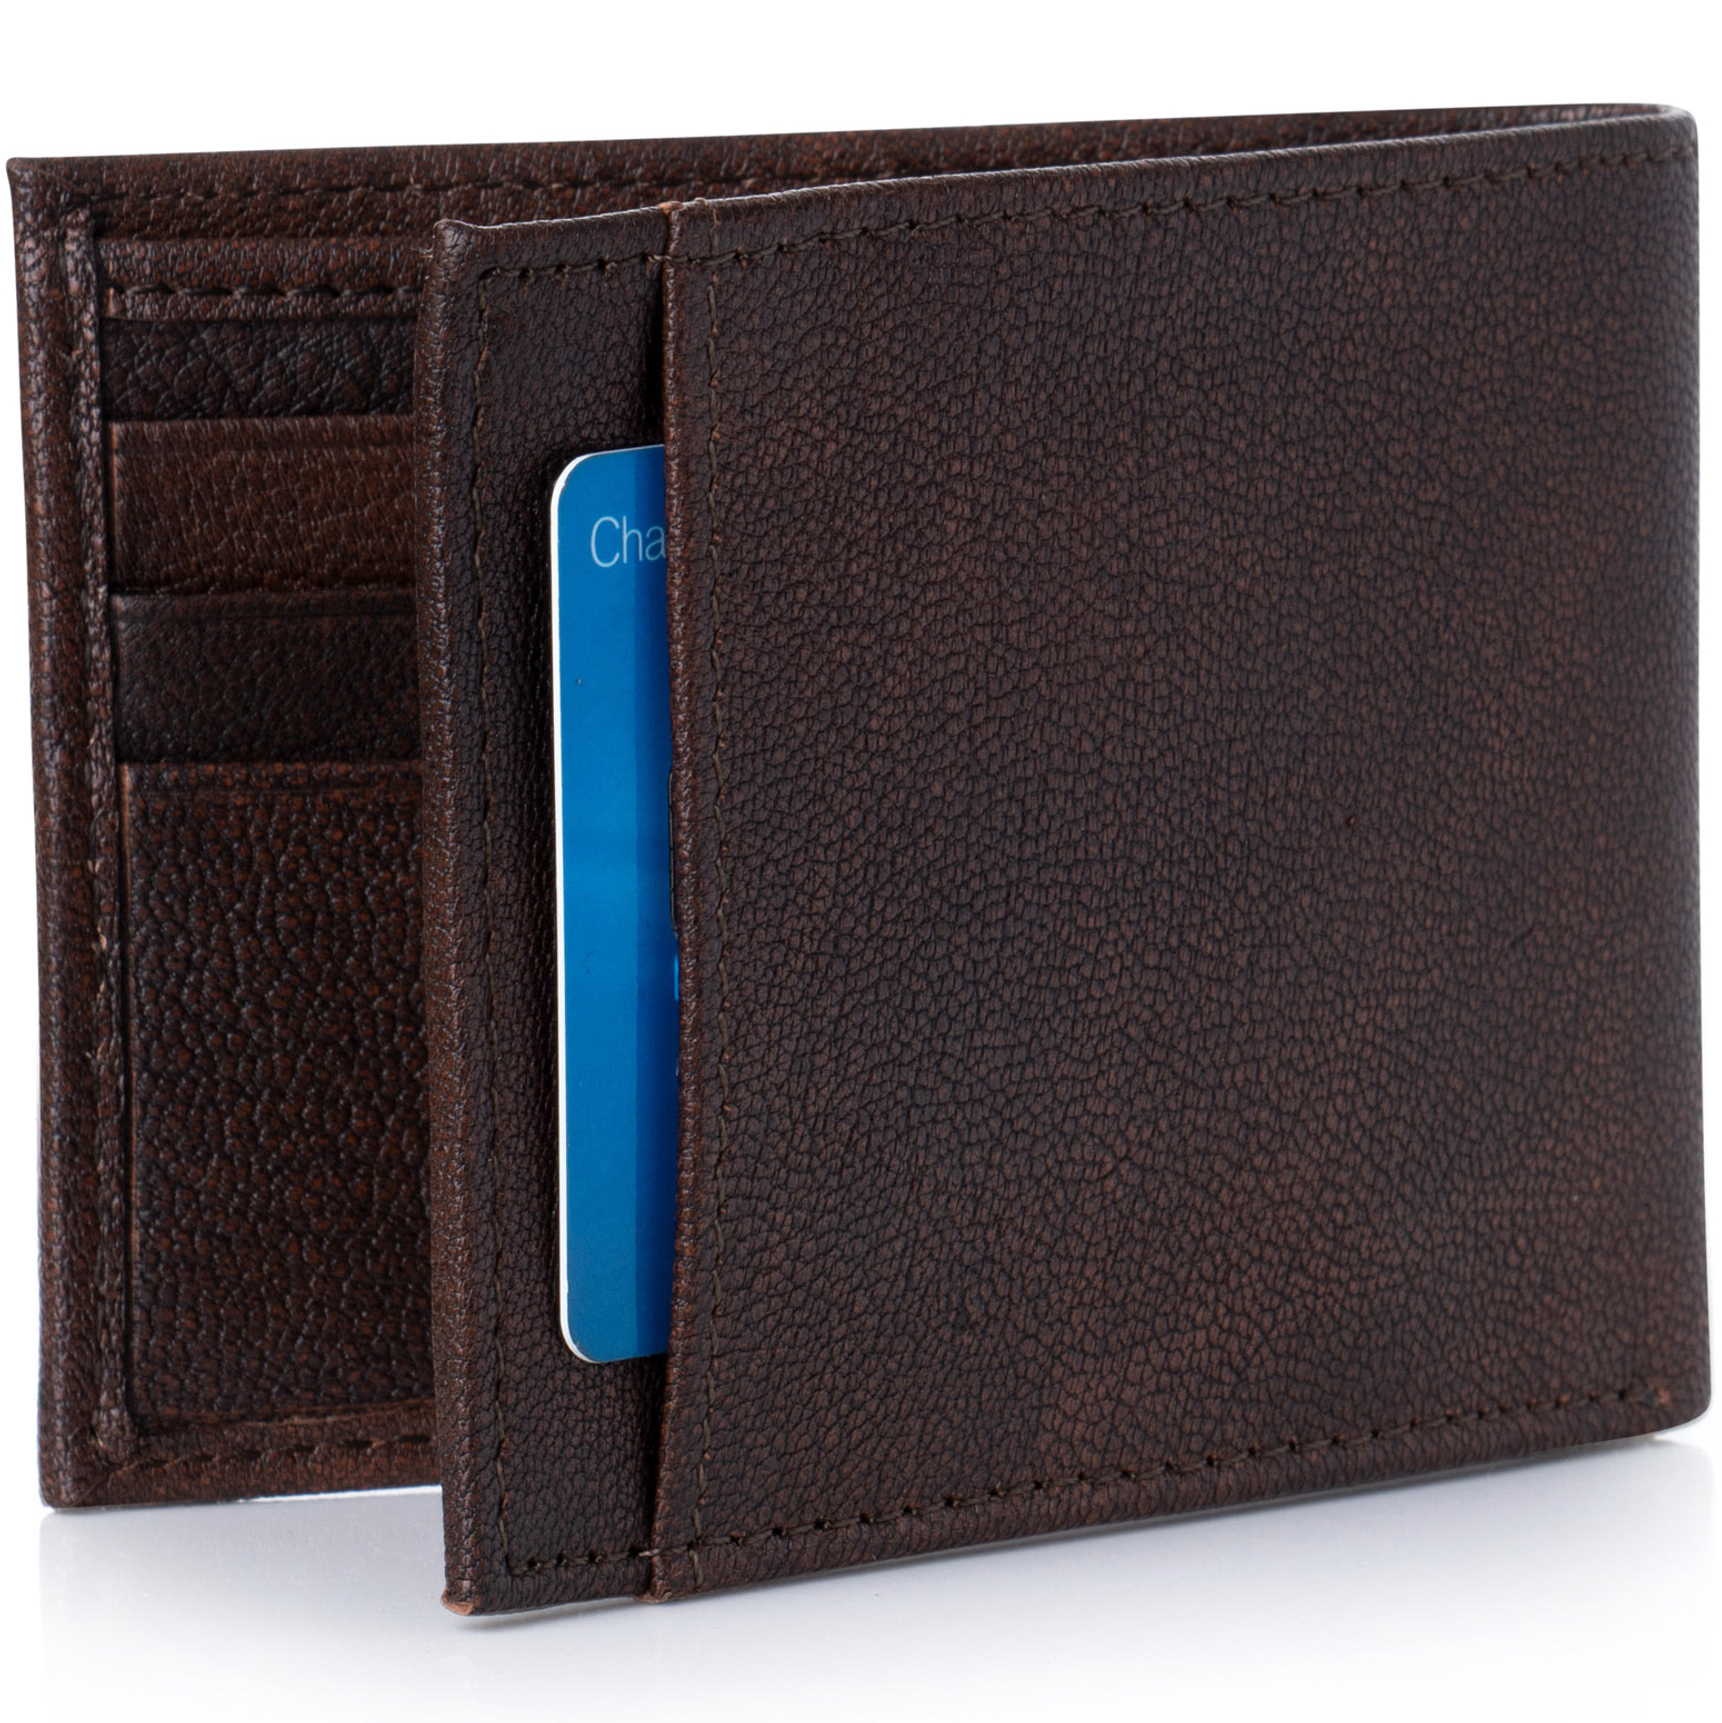 Alpine-Swiss-Mens-Thin-Bifold-Wallet-Top-Grain-Leather-EZ-Access-Outer-Card-Slot thumbnail 15